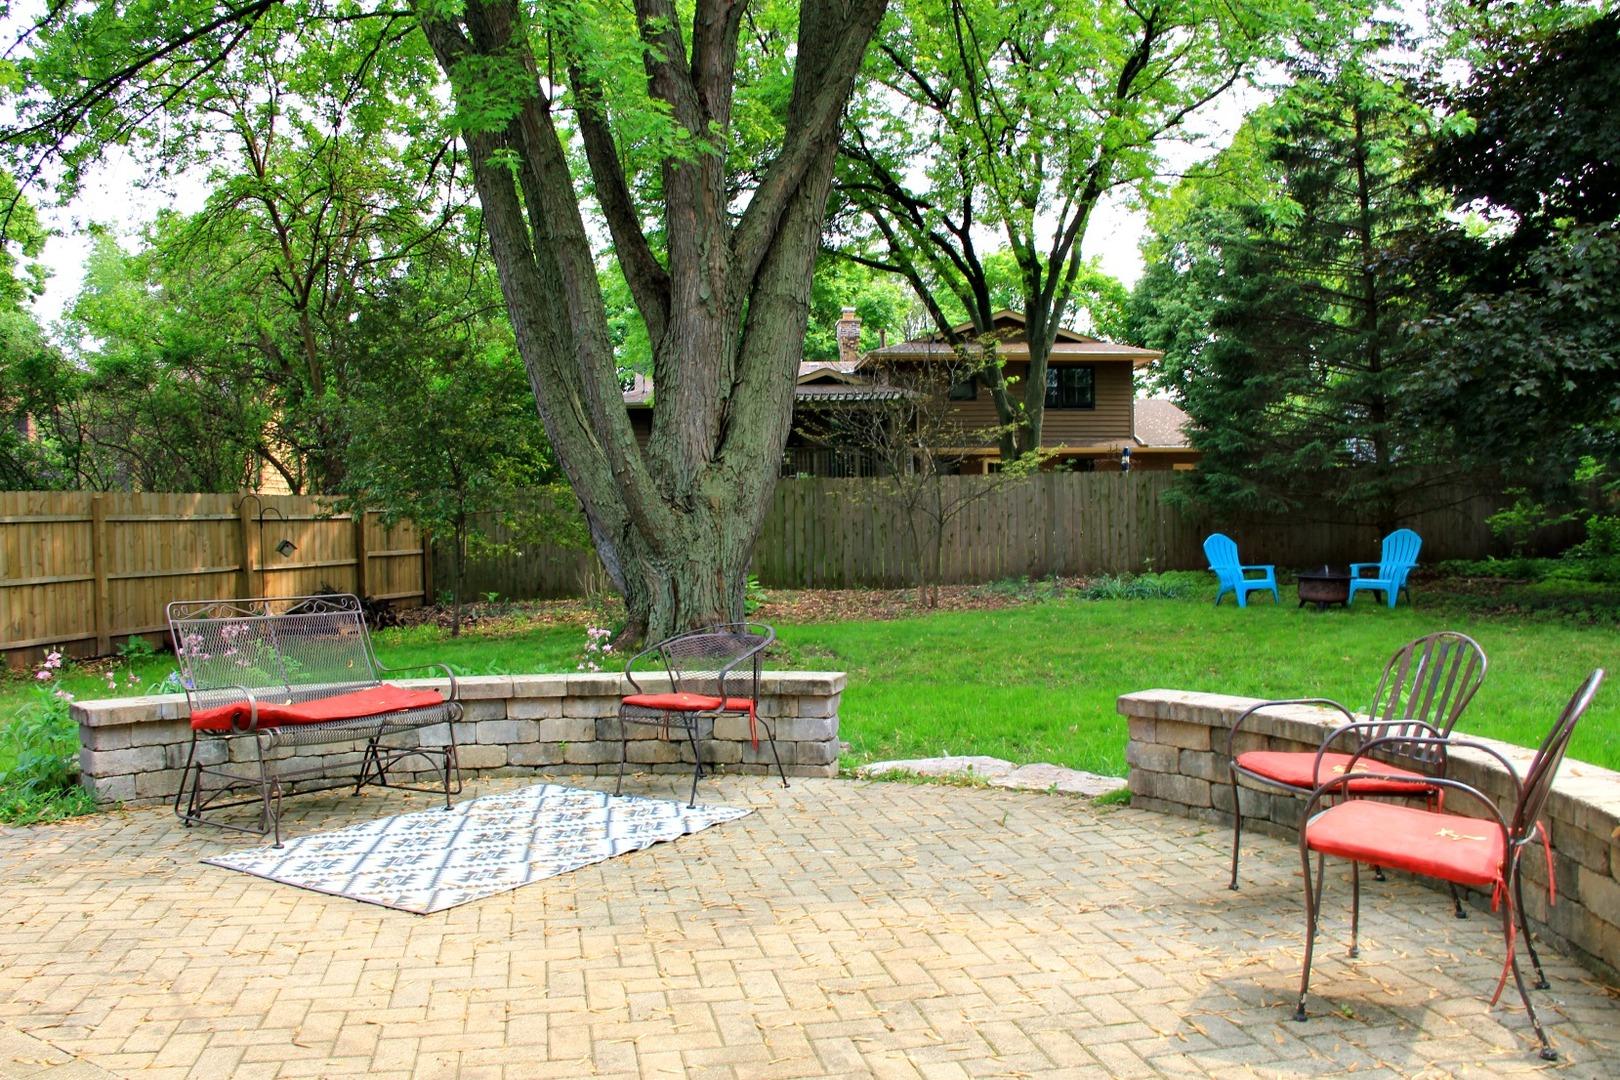 843 Margaret, ST. CHARLES, Illinois, 60174